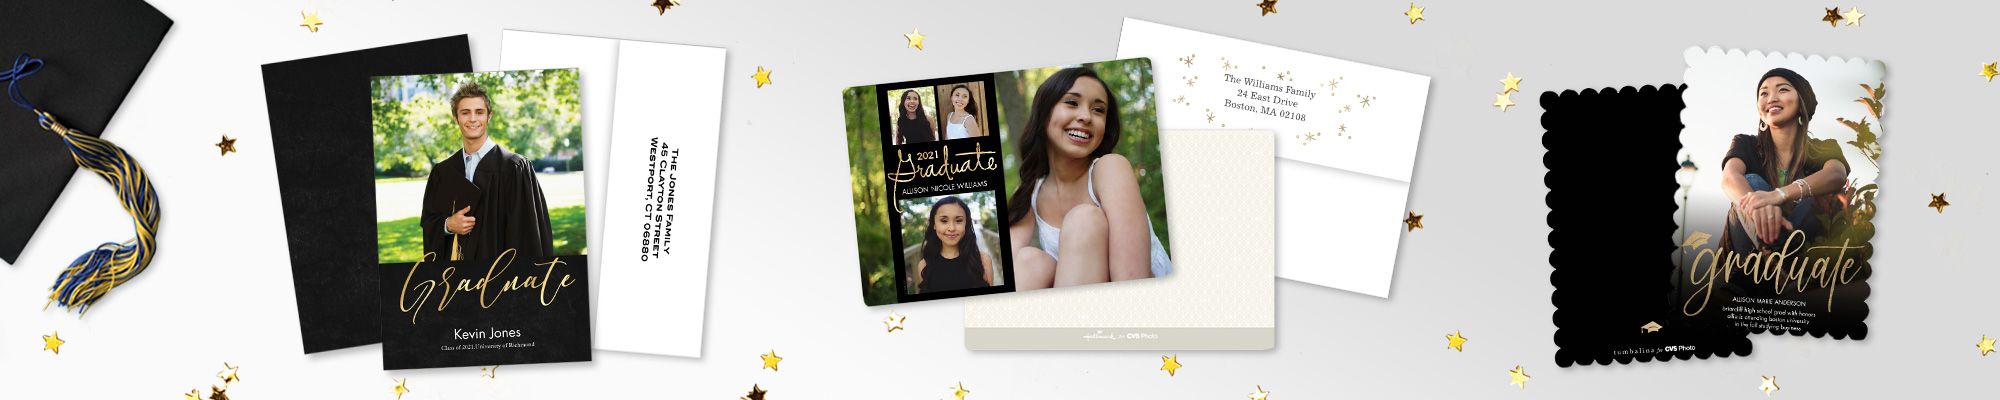 5x7 Premium Cards - The Perfect Graduation Card